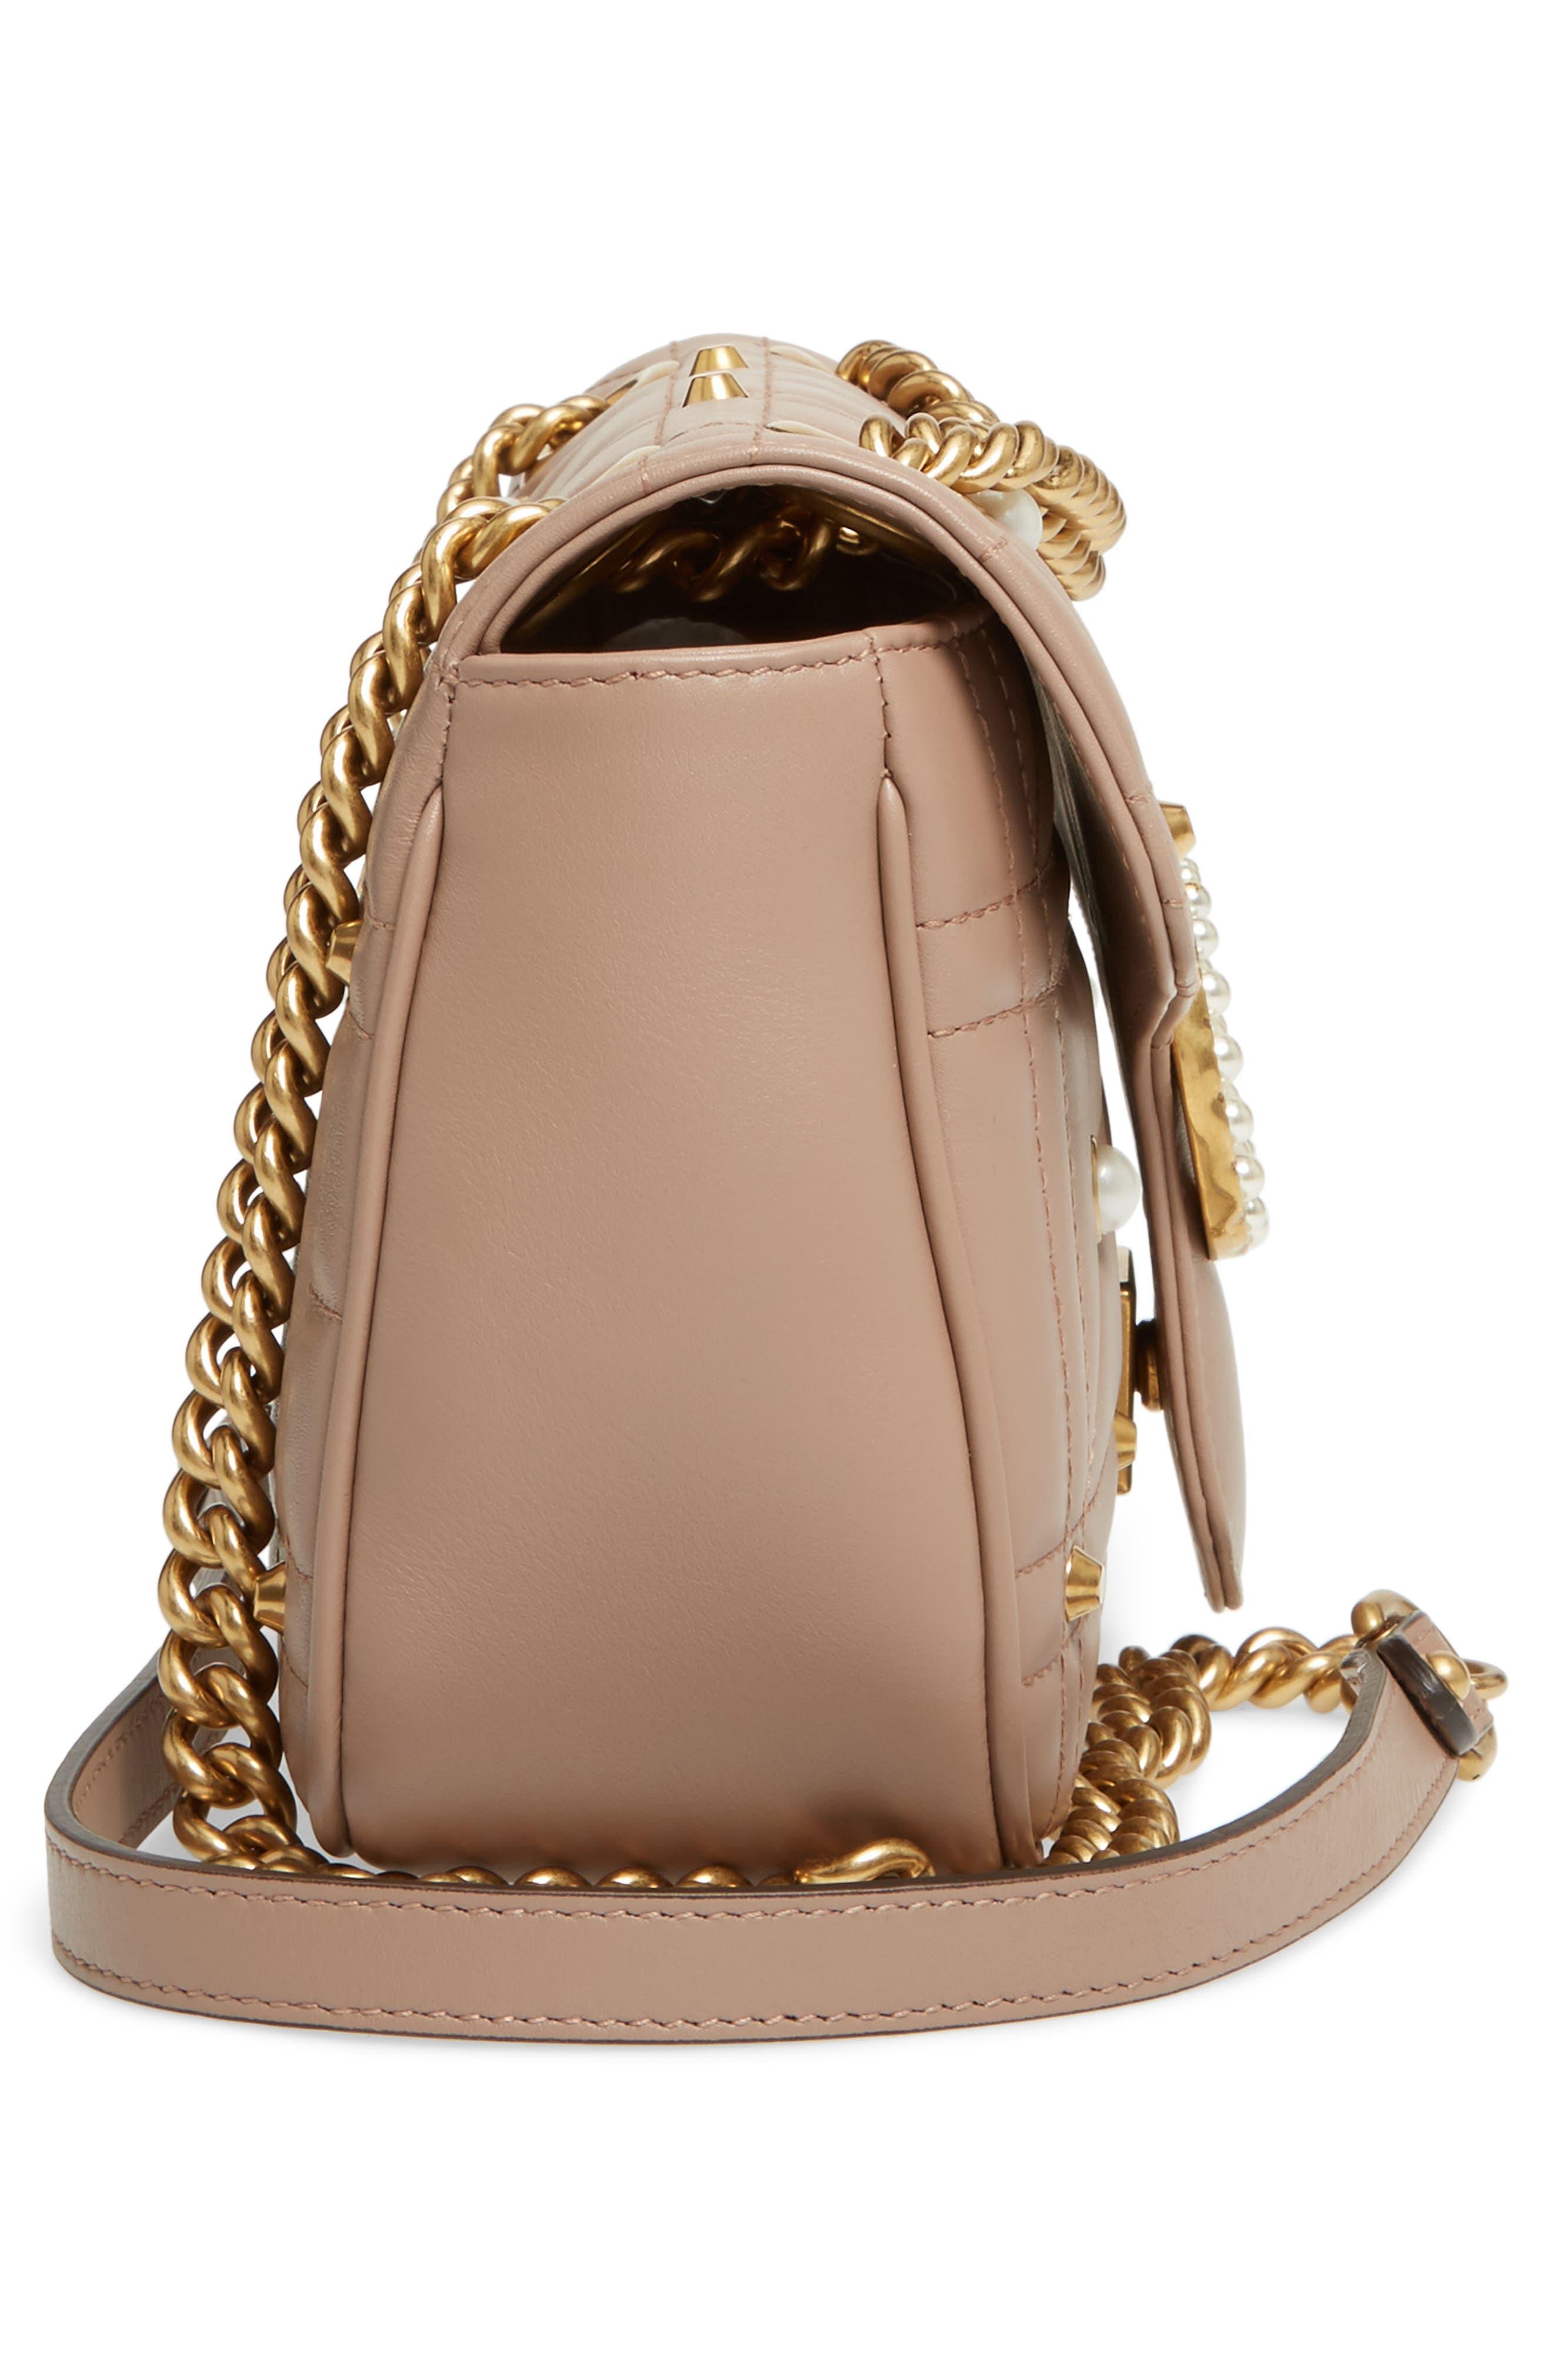 GG Marmont Matelassé Imitation Pearl Leather Shoulder Bag,                             Alternate thumbnail 4, color,                             White/ Pink